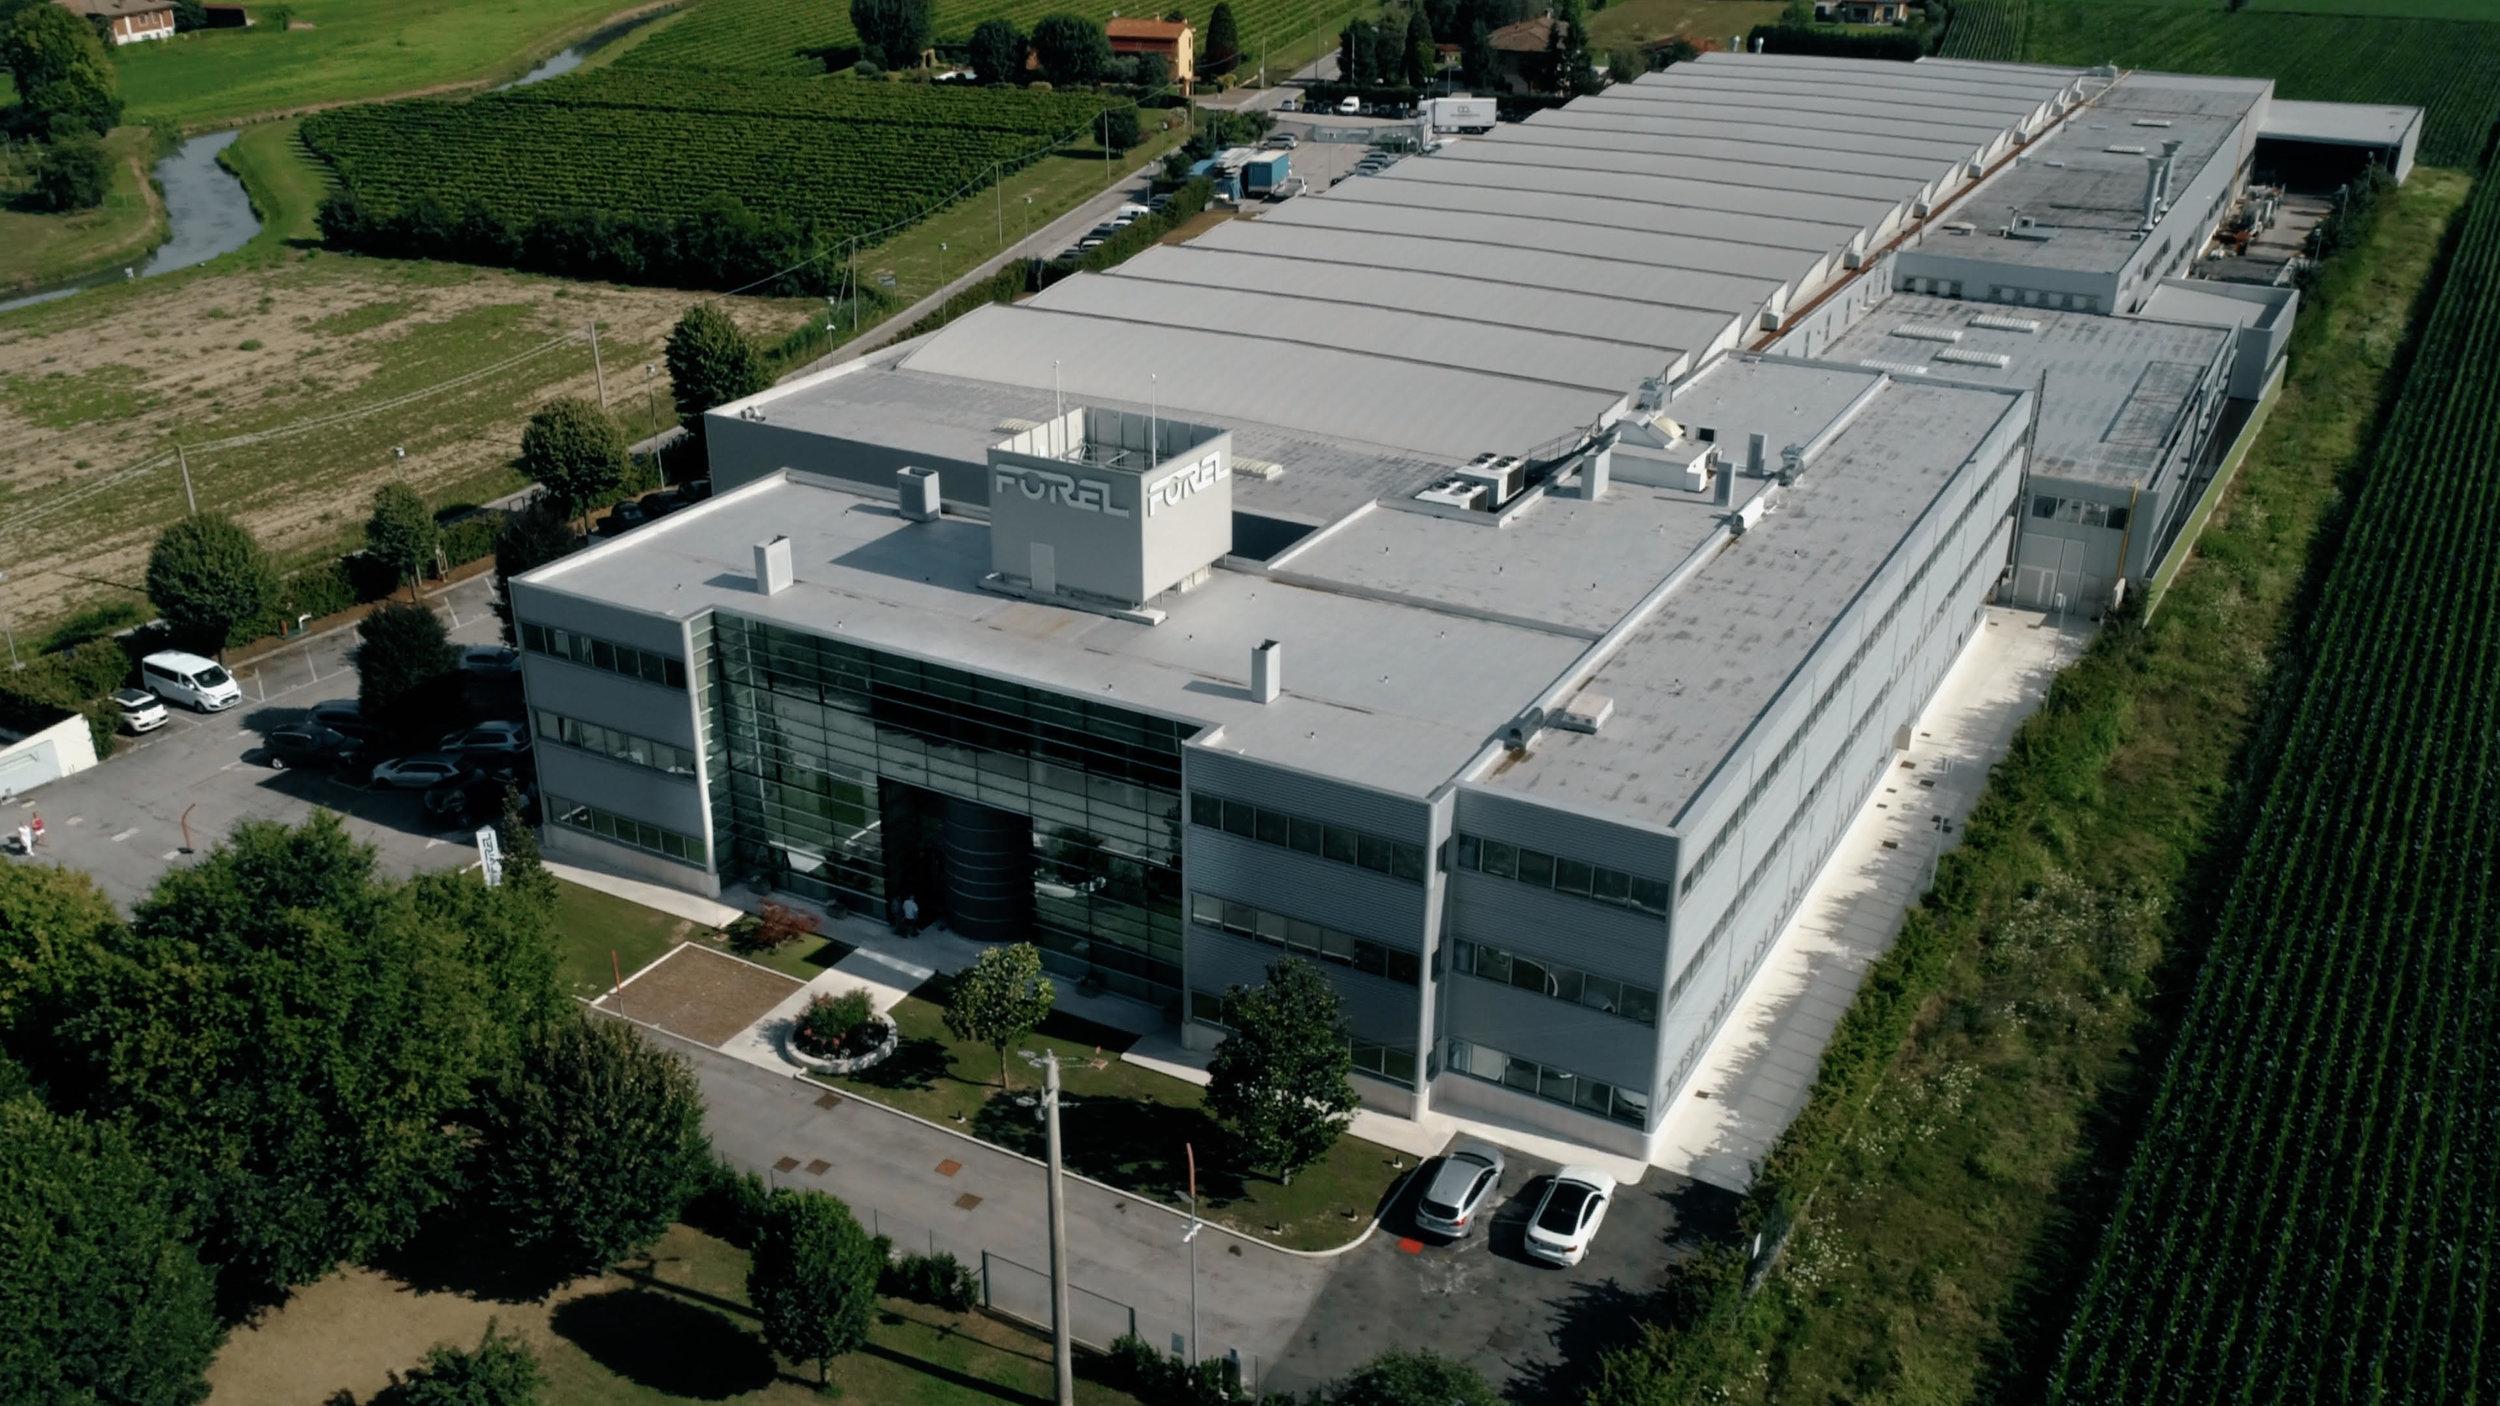 Forel Plant - Treviso (Italy)